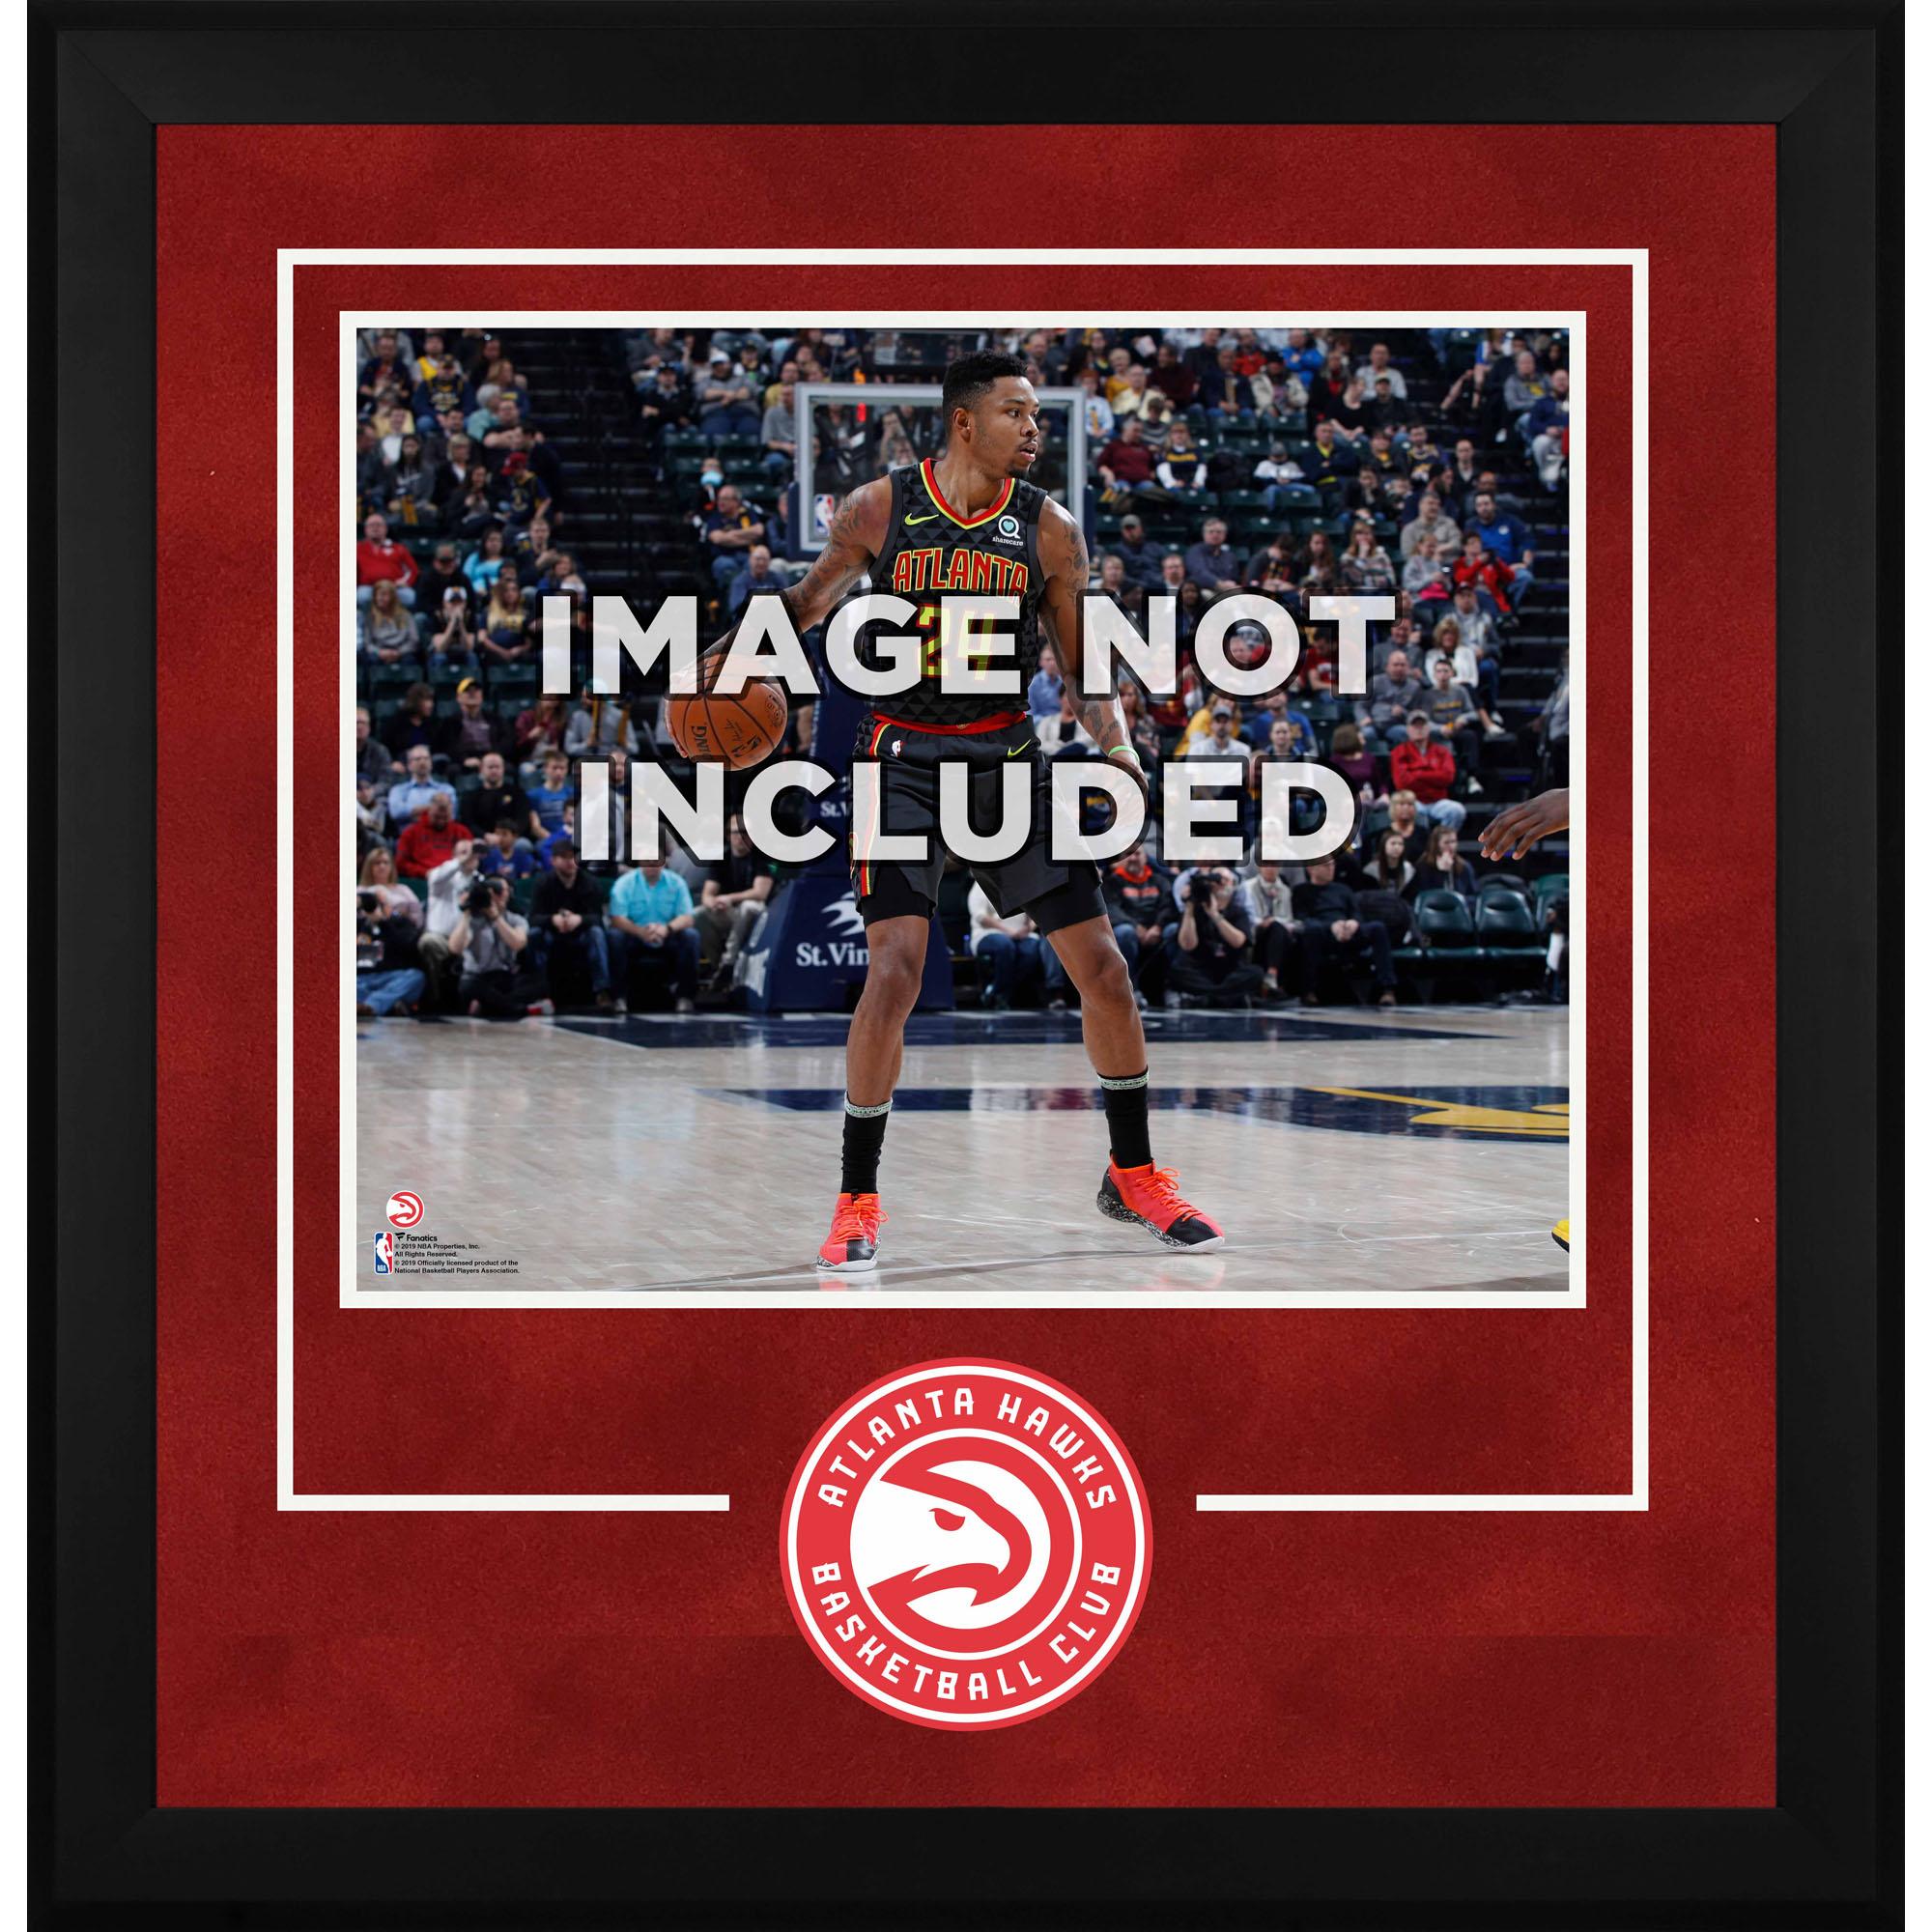 "Atlanta Hawks Fanatics Authentic 16"" x 20"" Horizontal Deluxe Setup Frame with Team Logo"